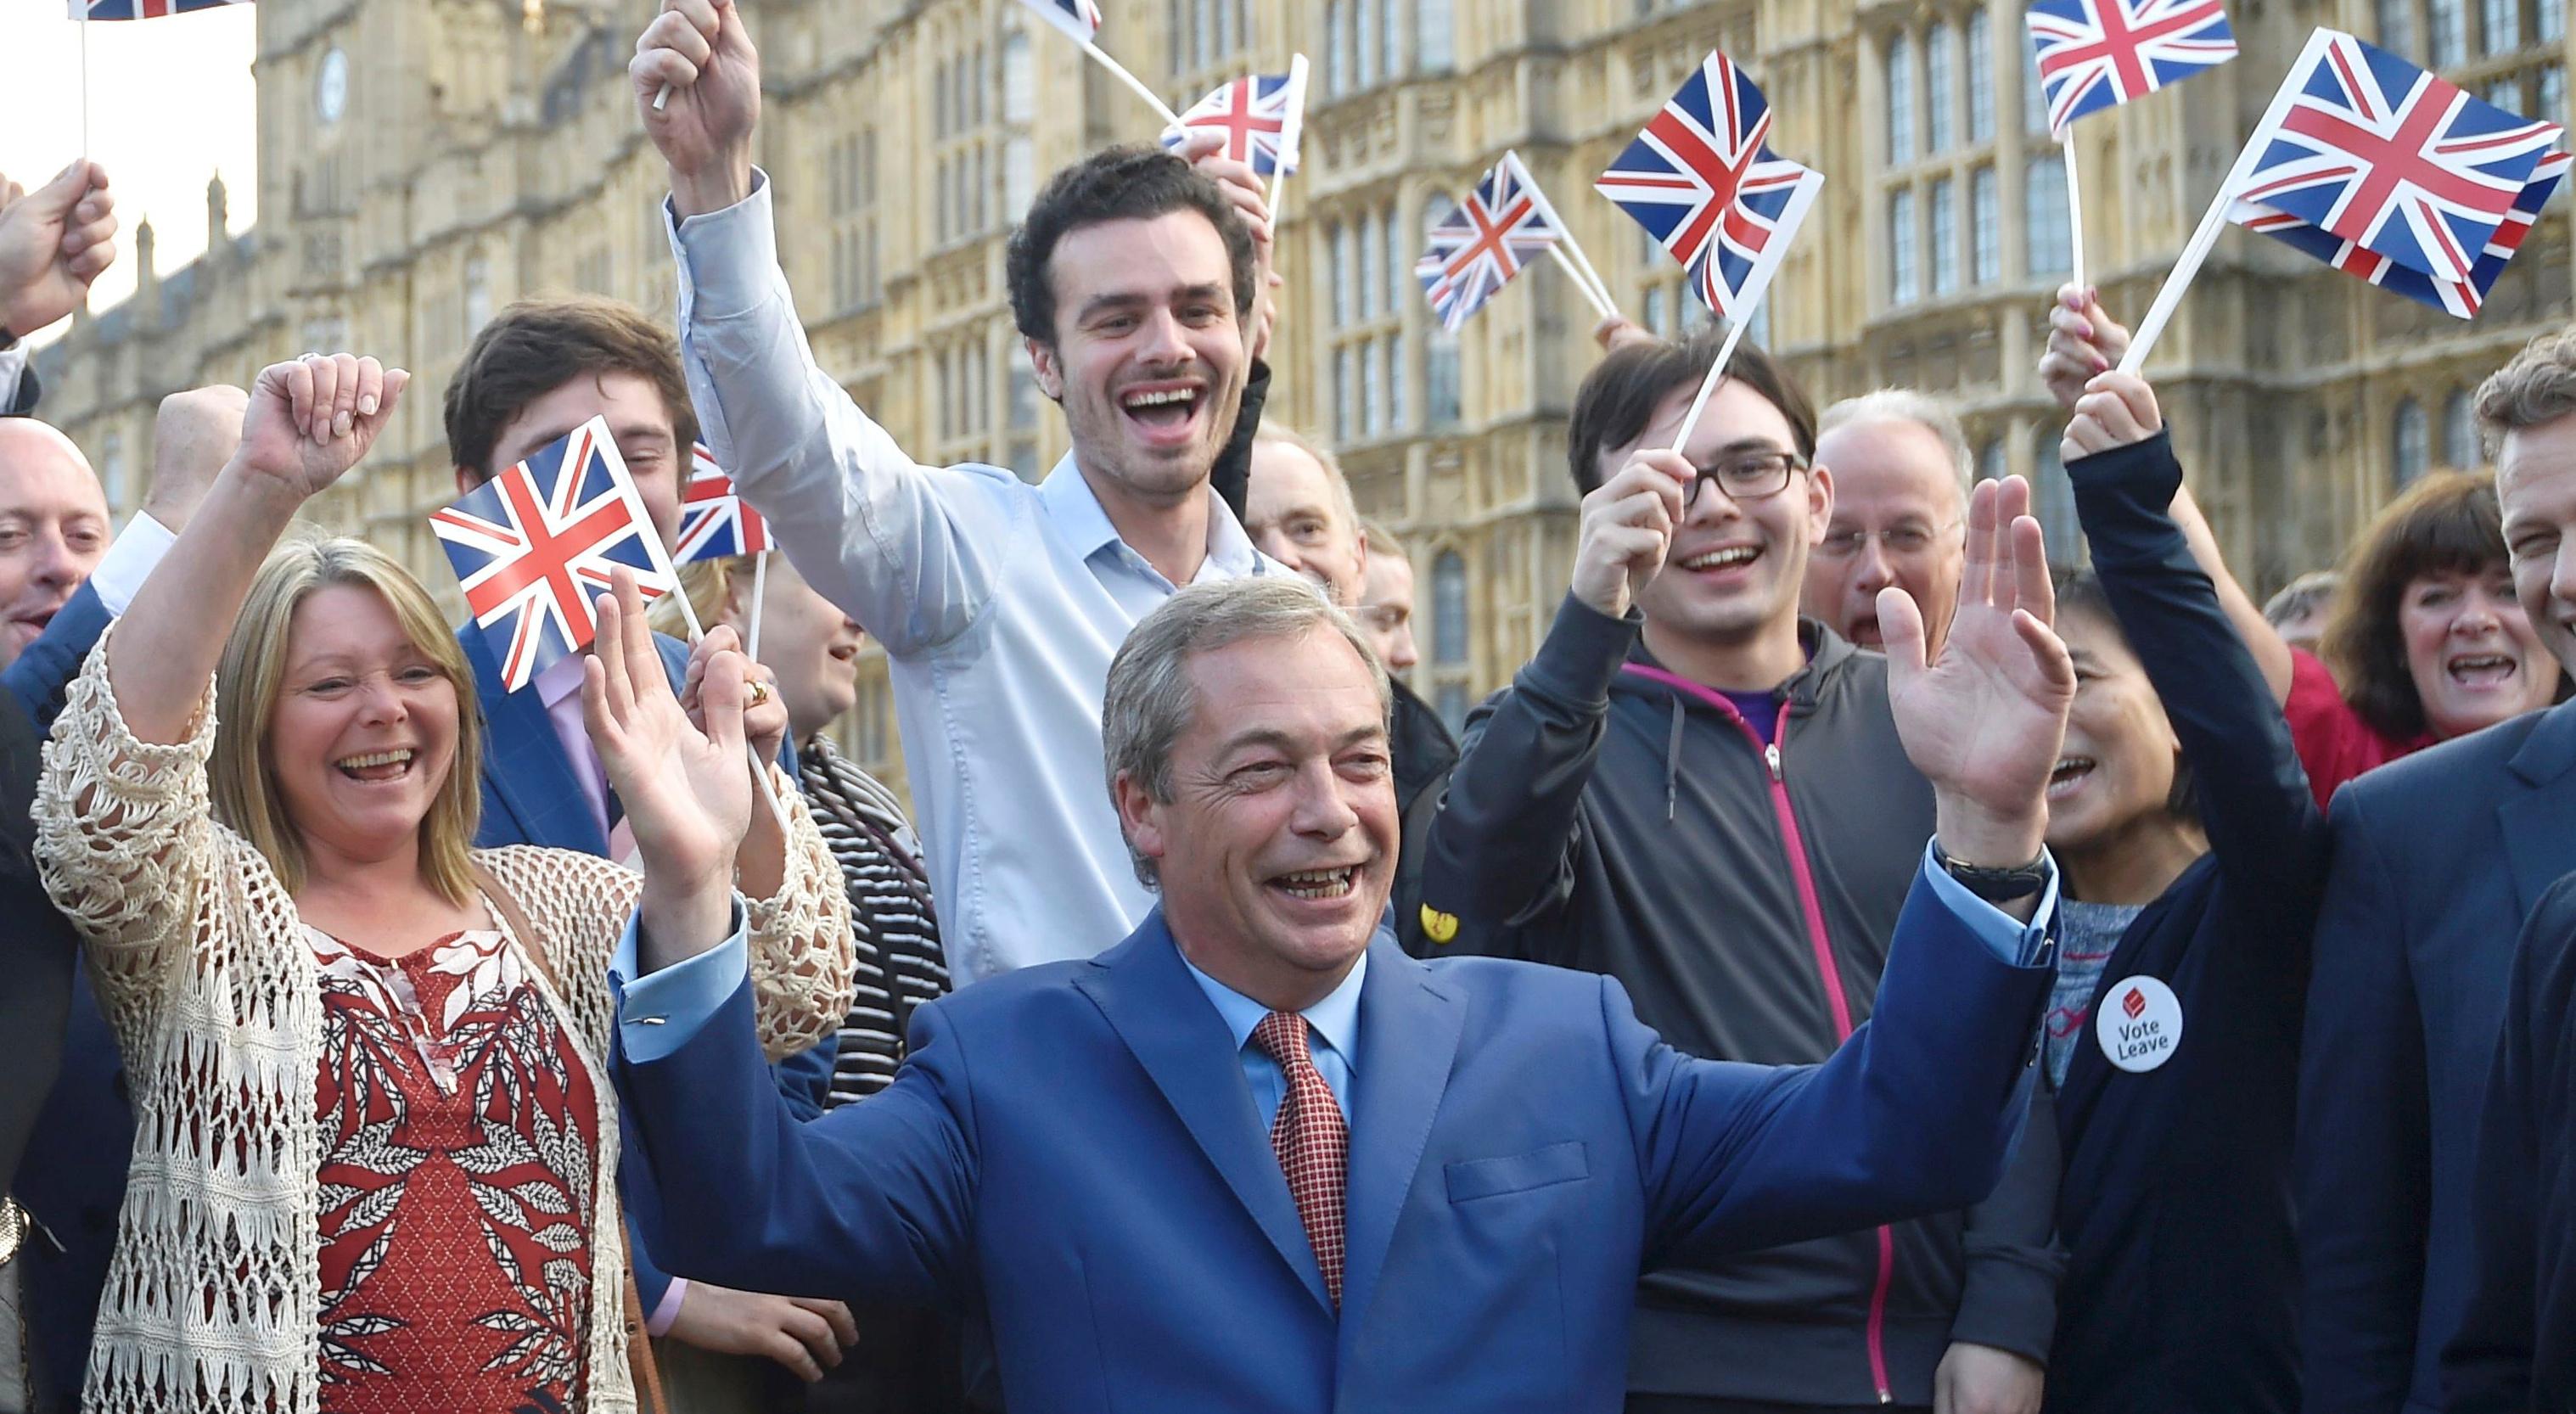 Voters celebrate Brexit vote